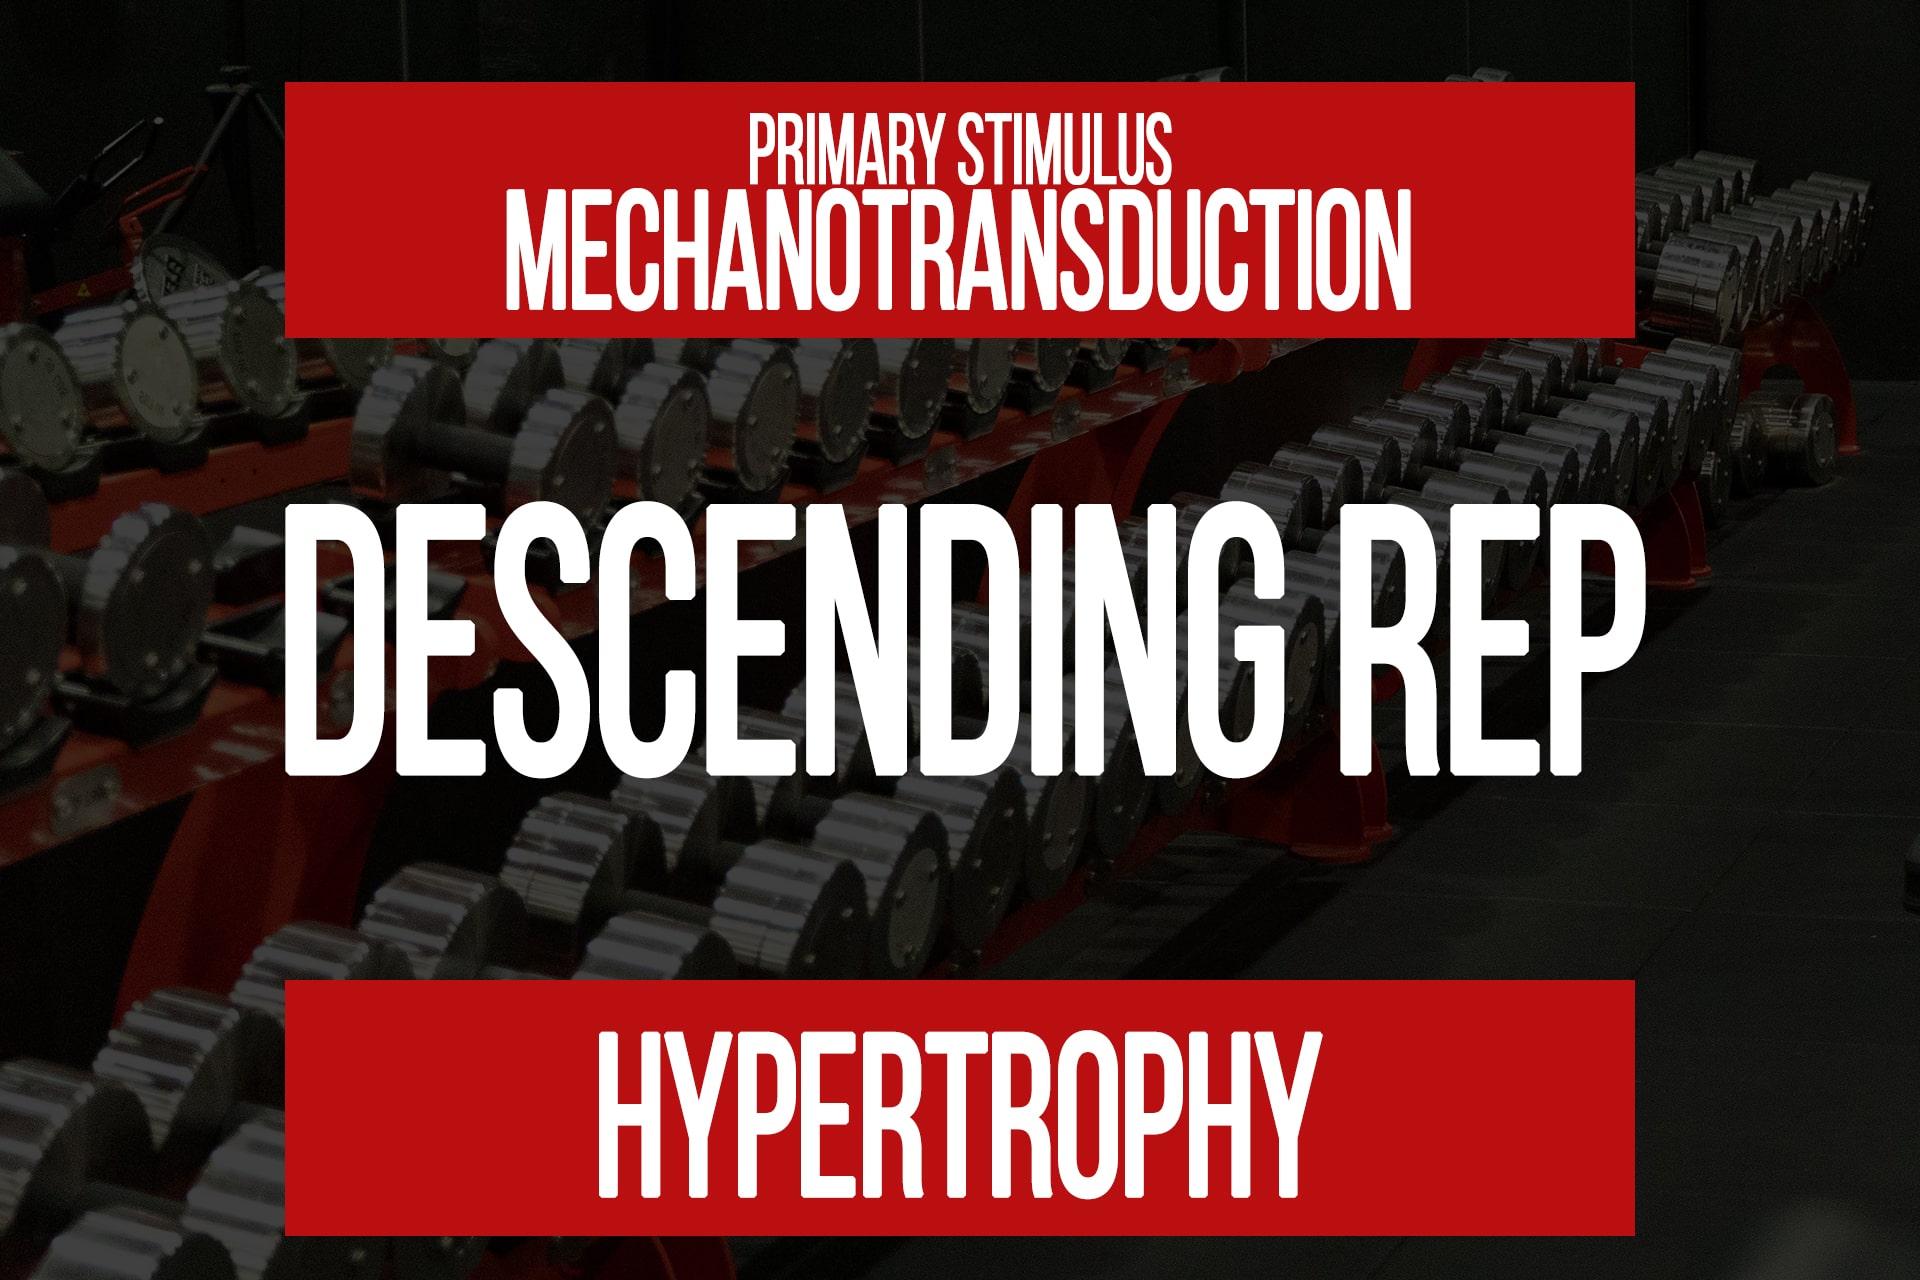 Descending Rep